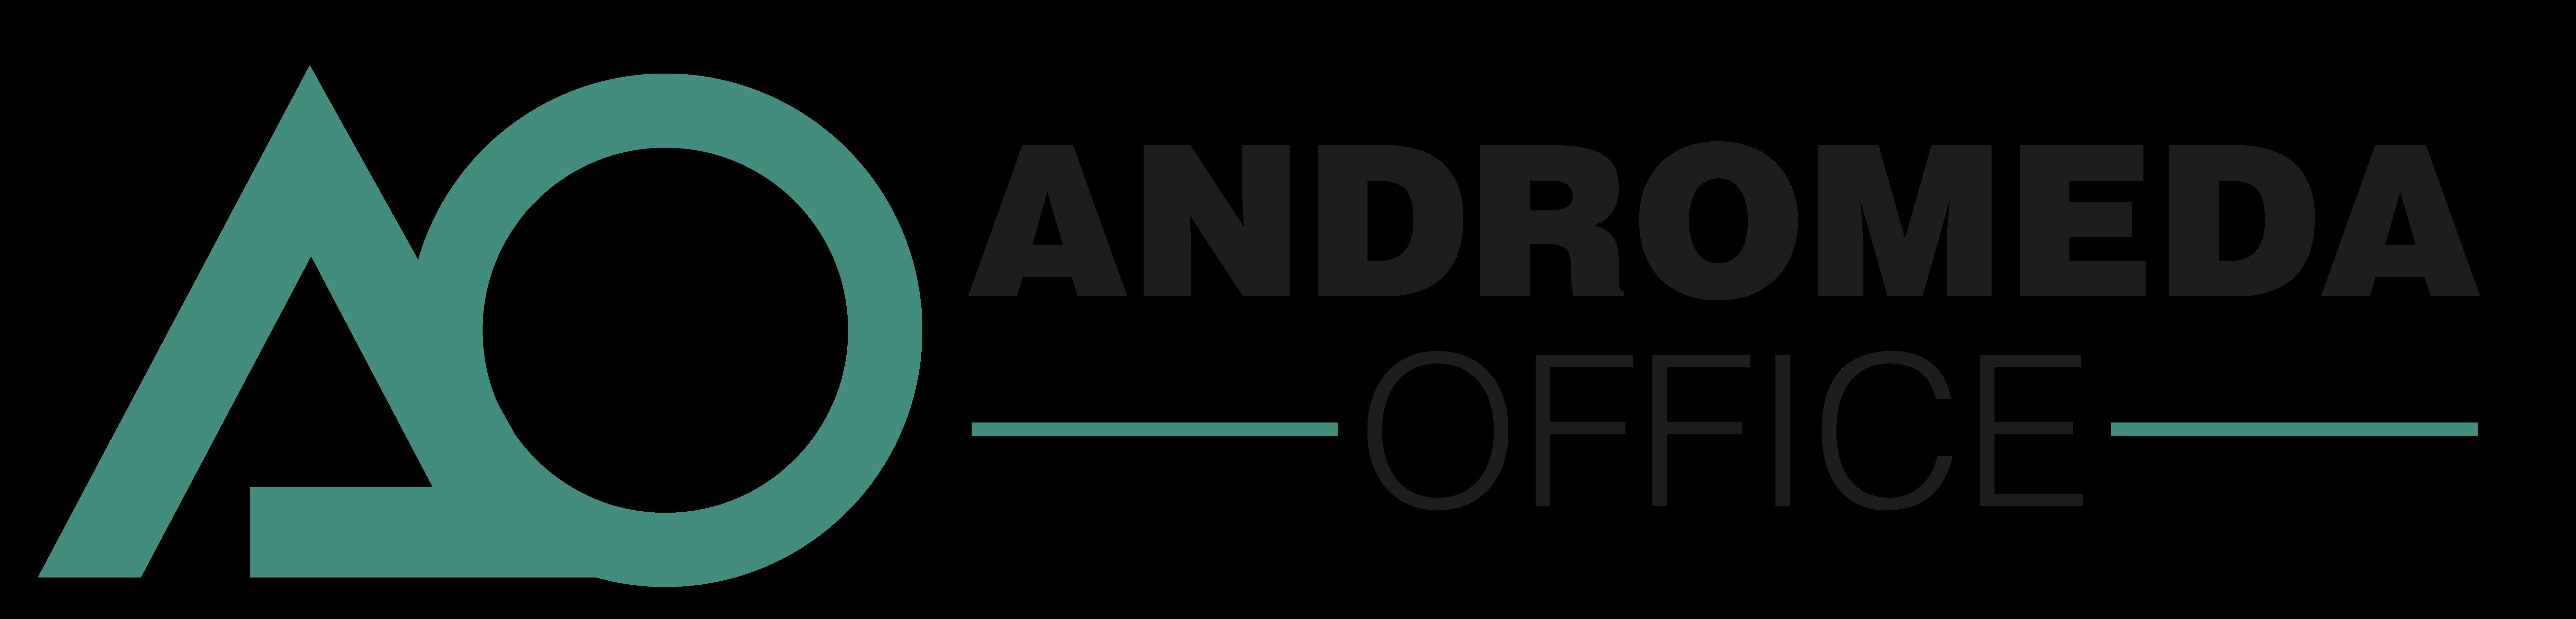 Andromeda Office Srl